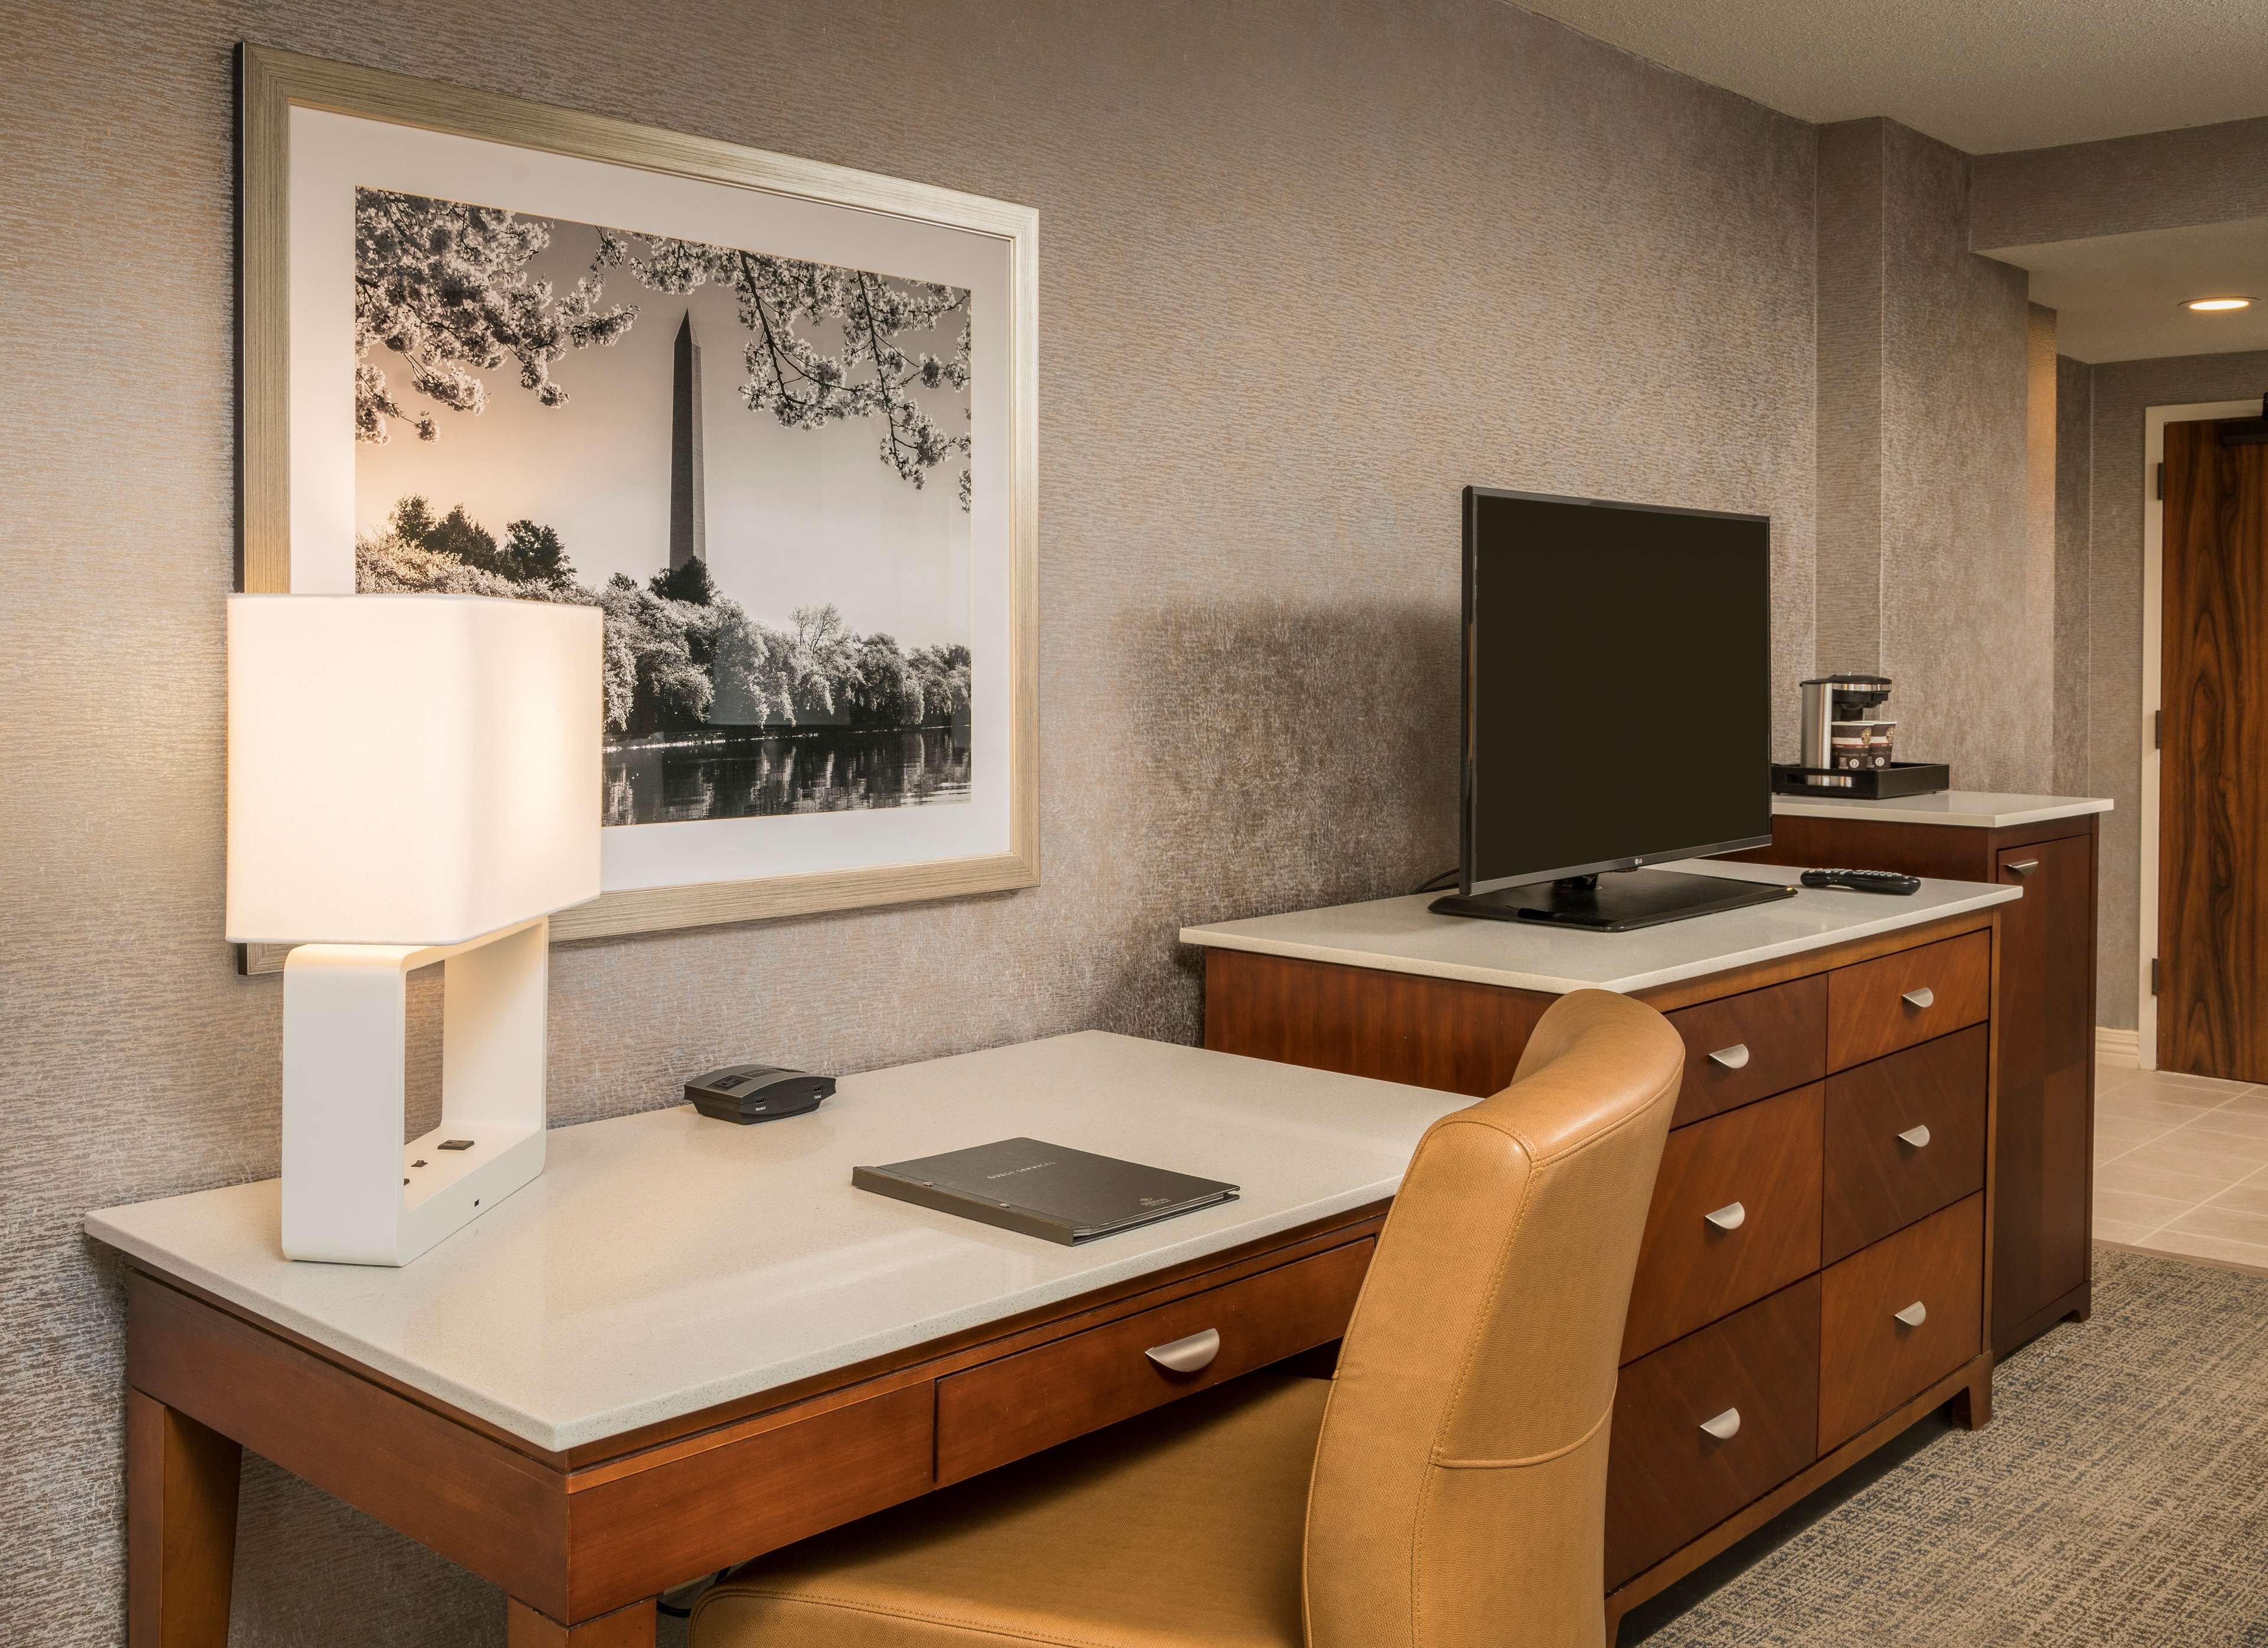 Hilton Washington DC/Rockville Hotel & Executive Meeting Ctr image 41